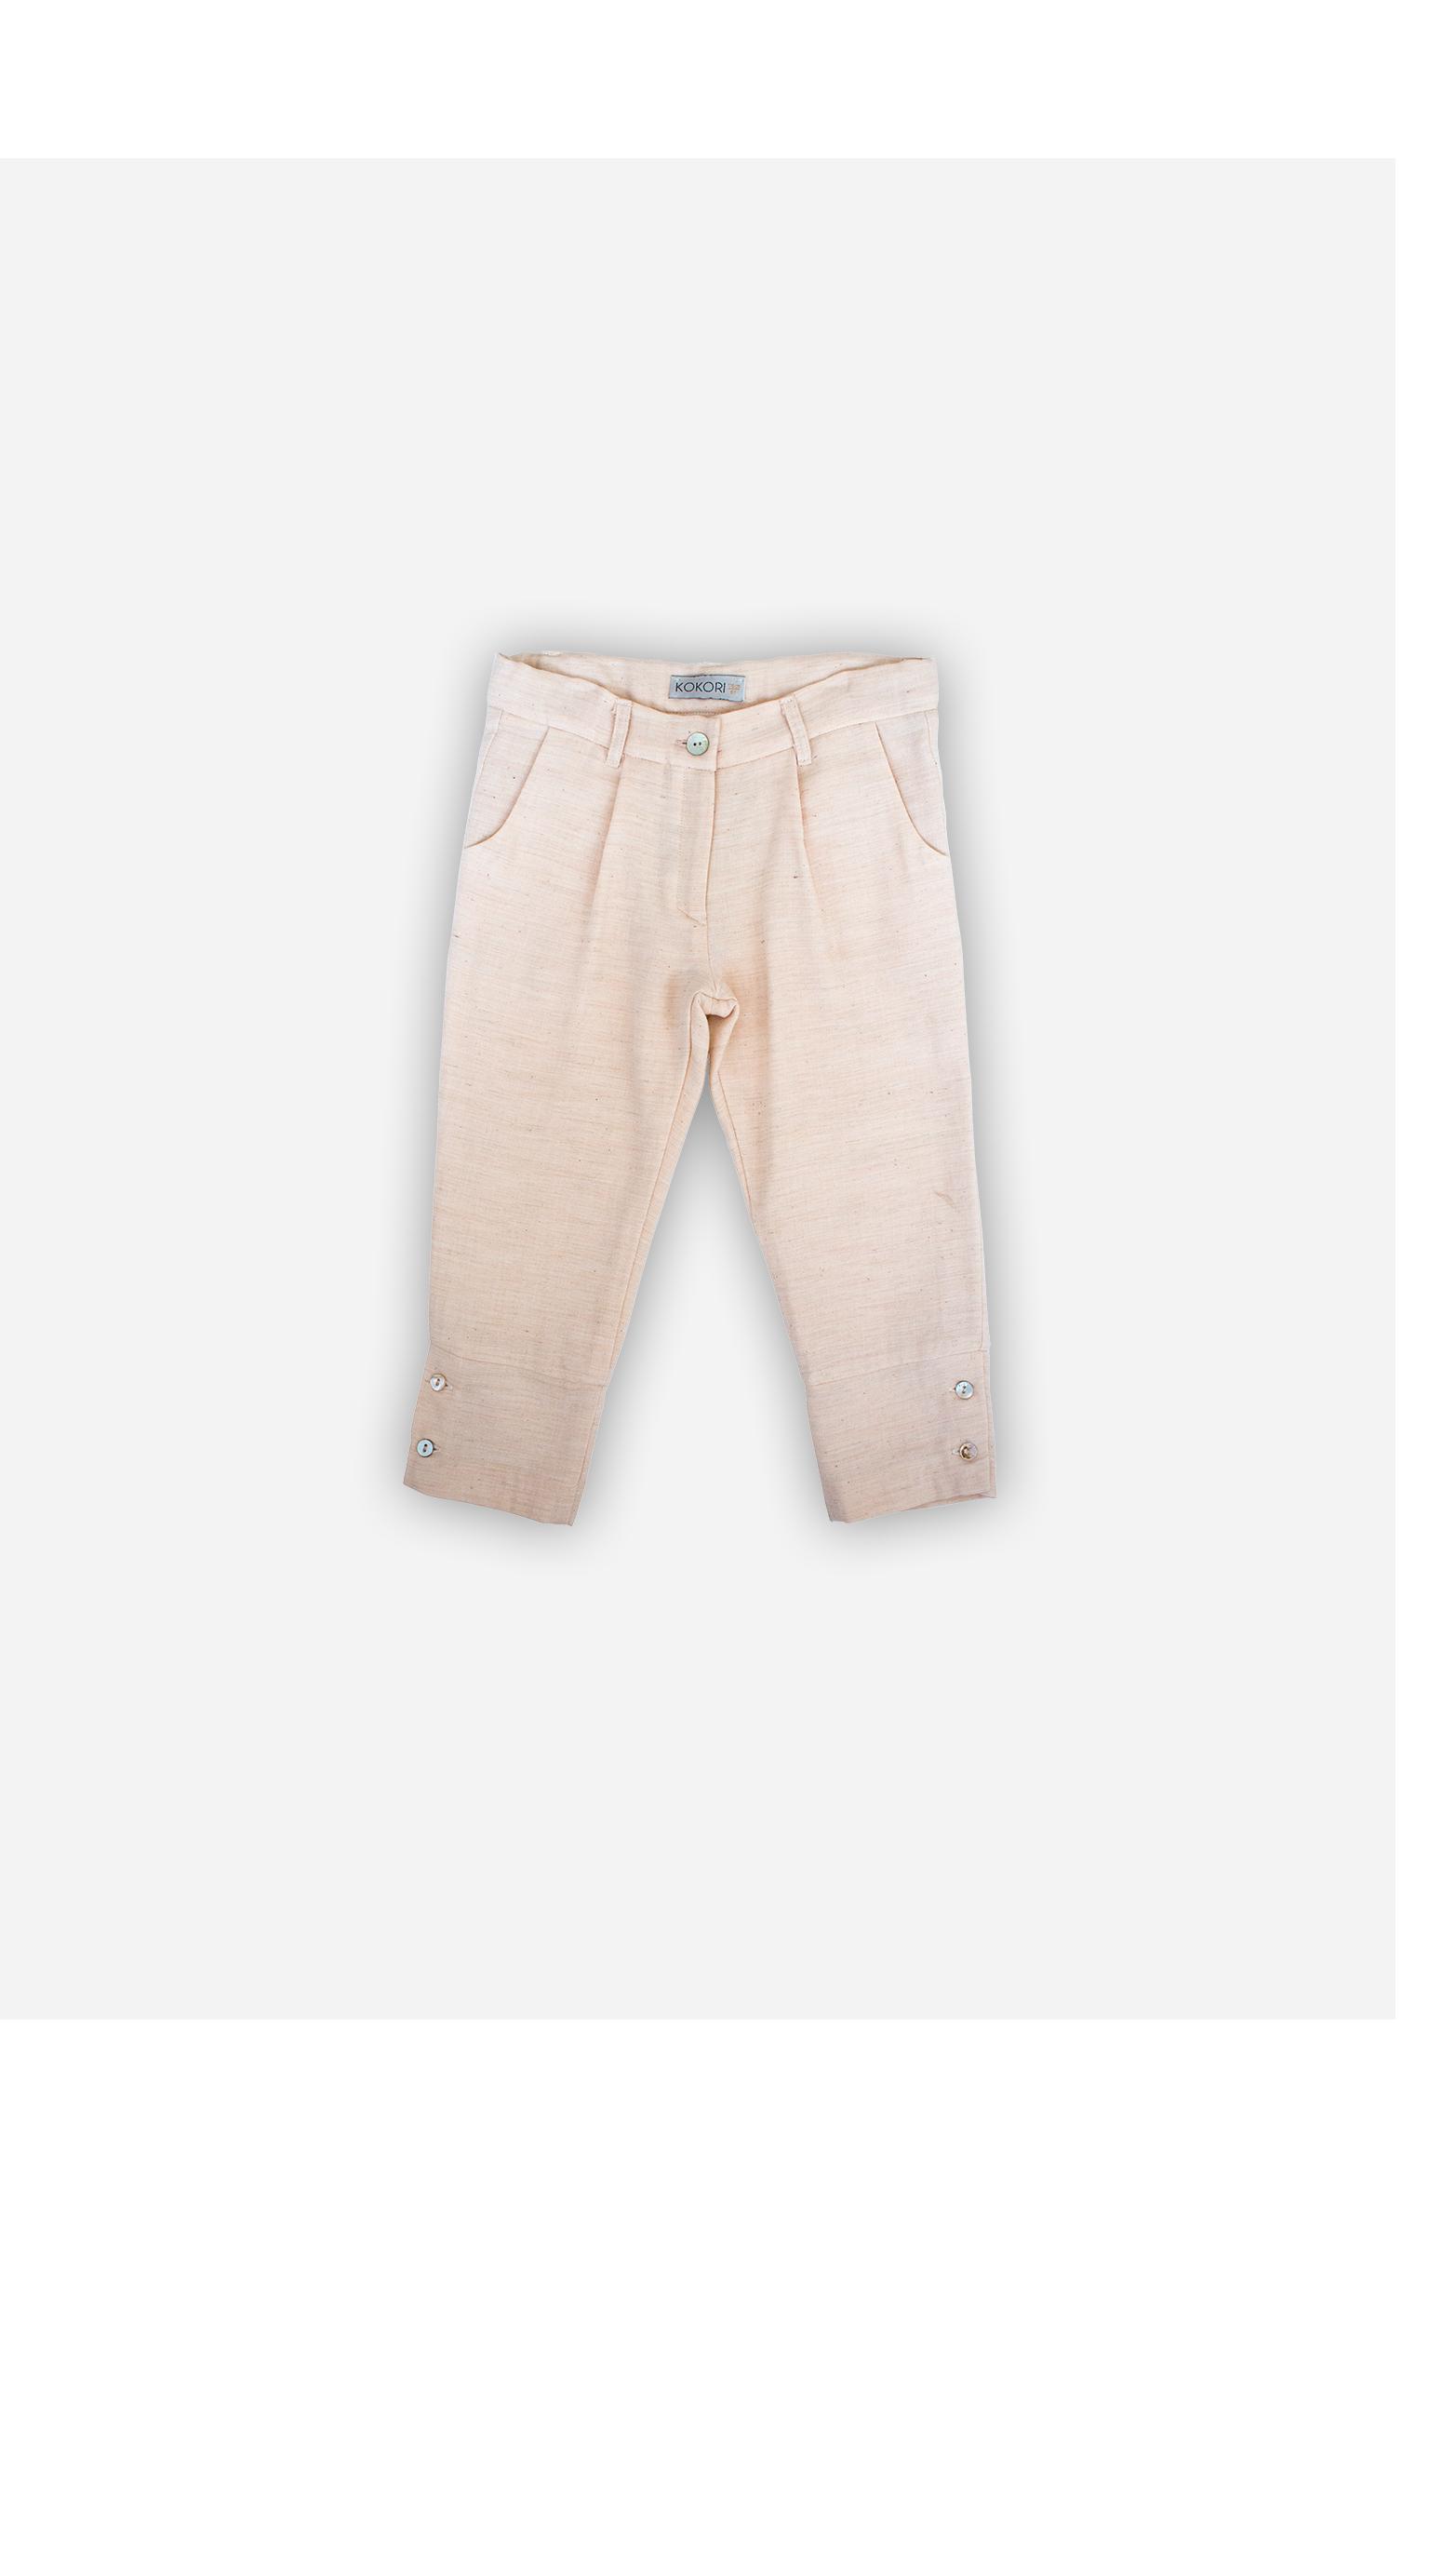 brighton trousers